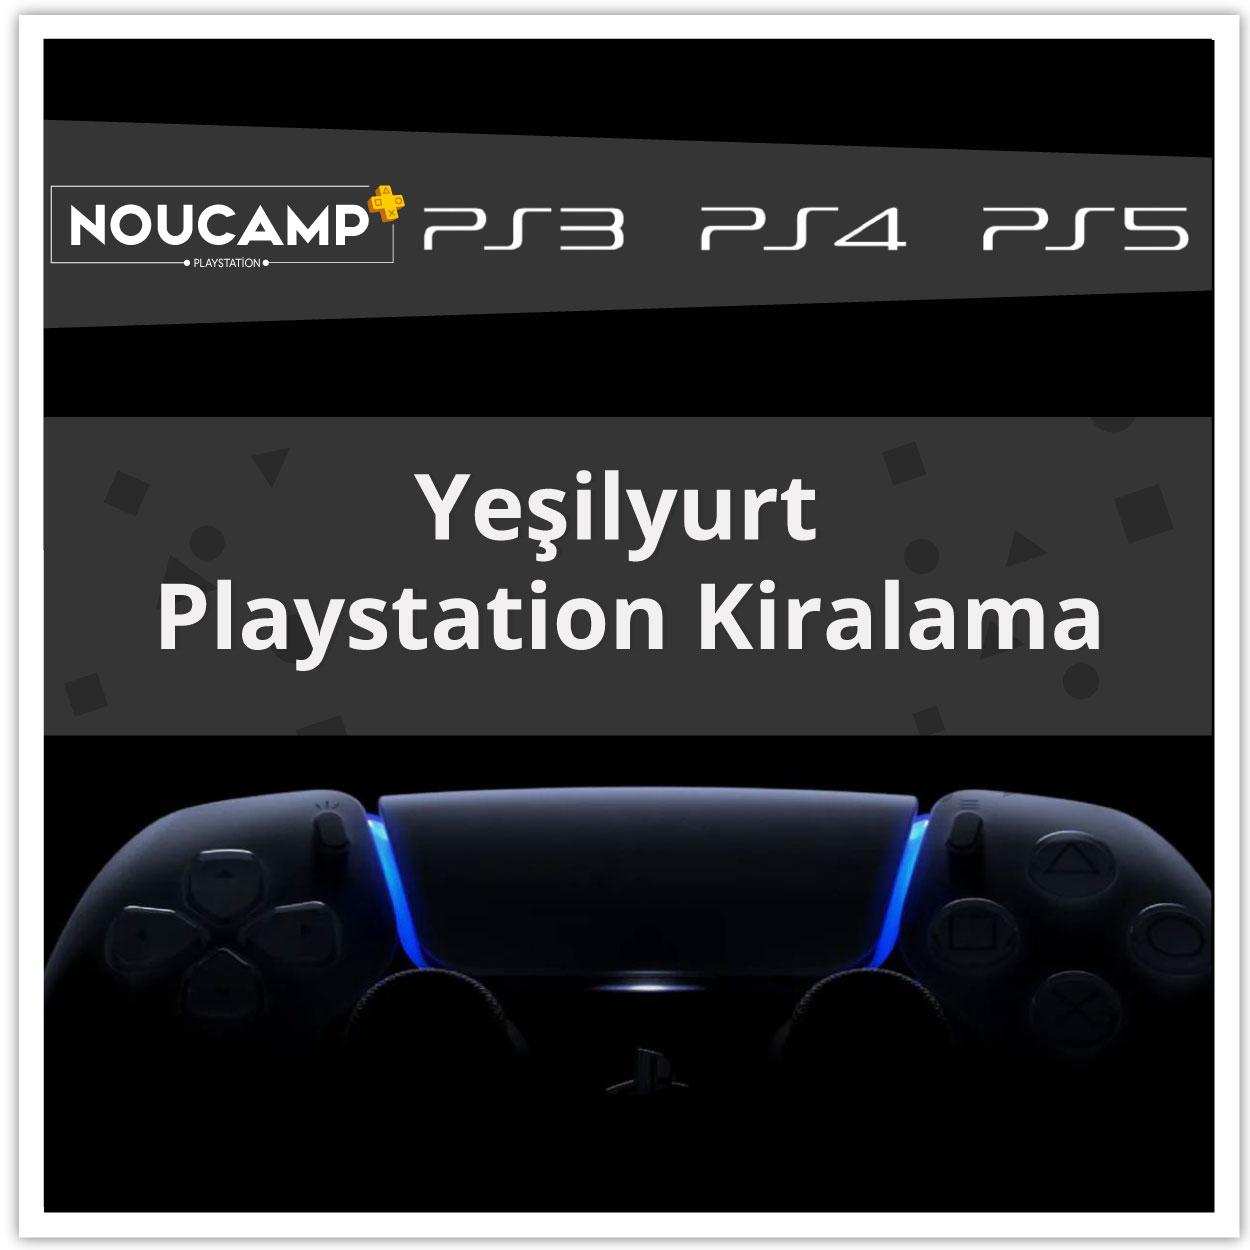 Yeşilyurt PlayStation Kiralama